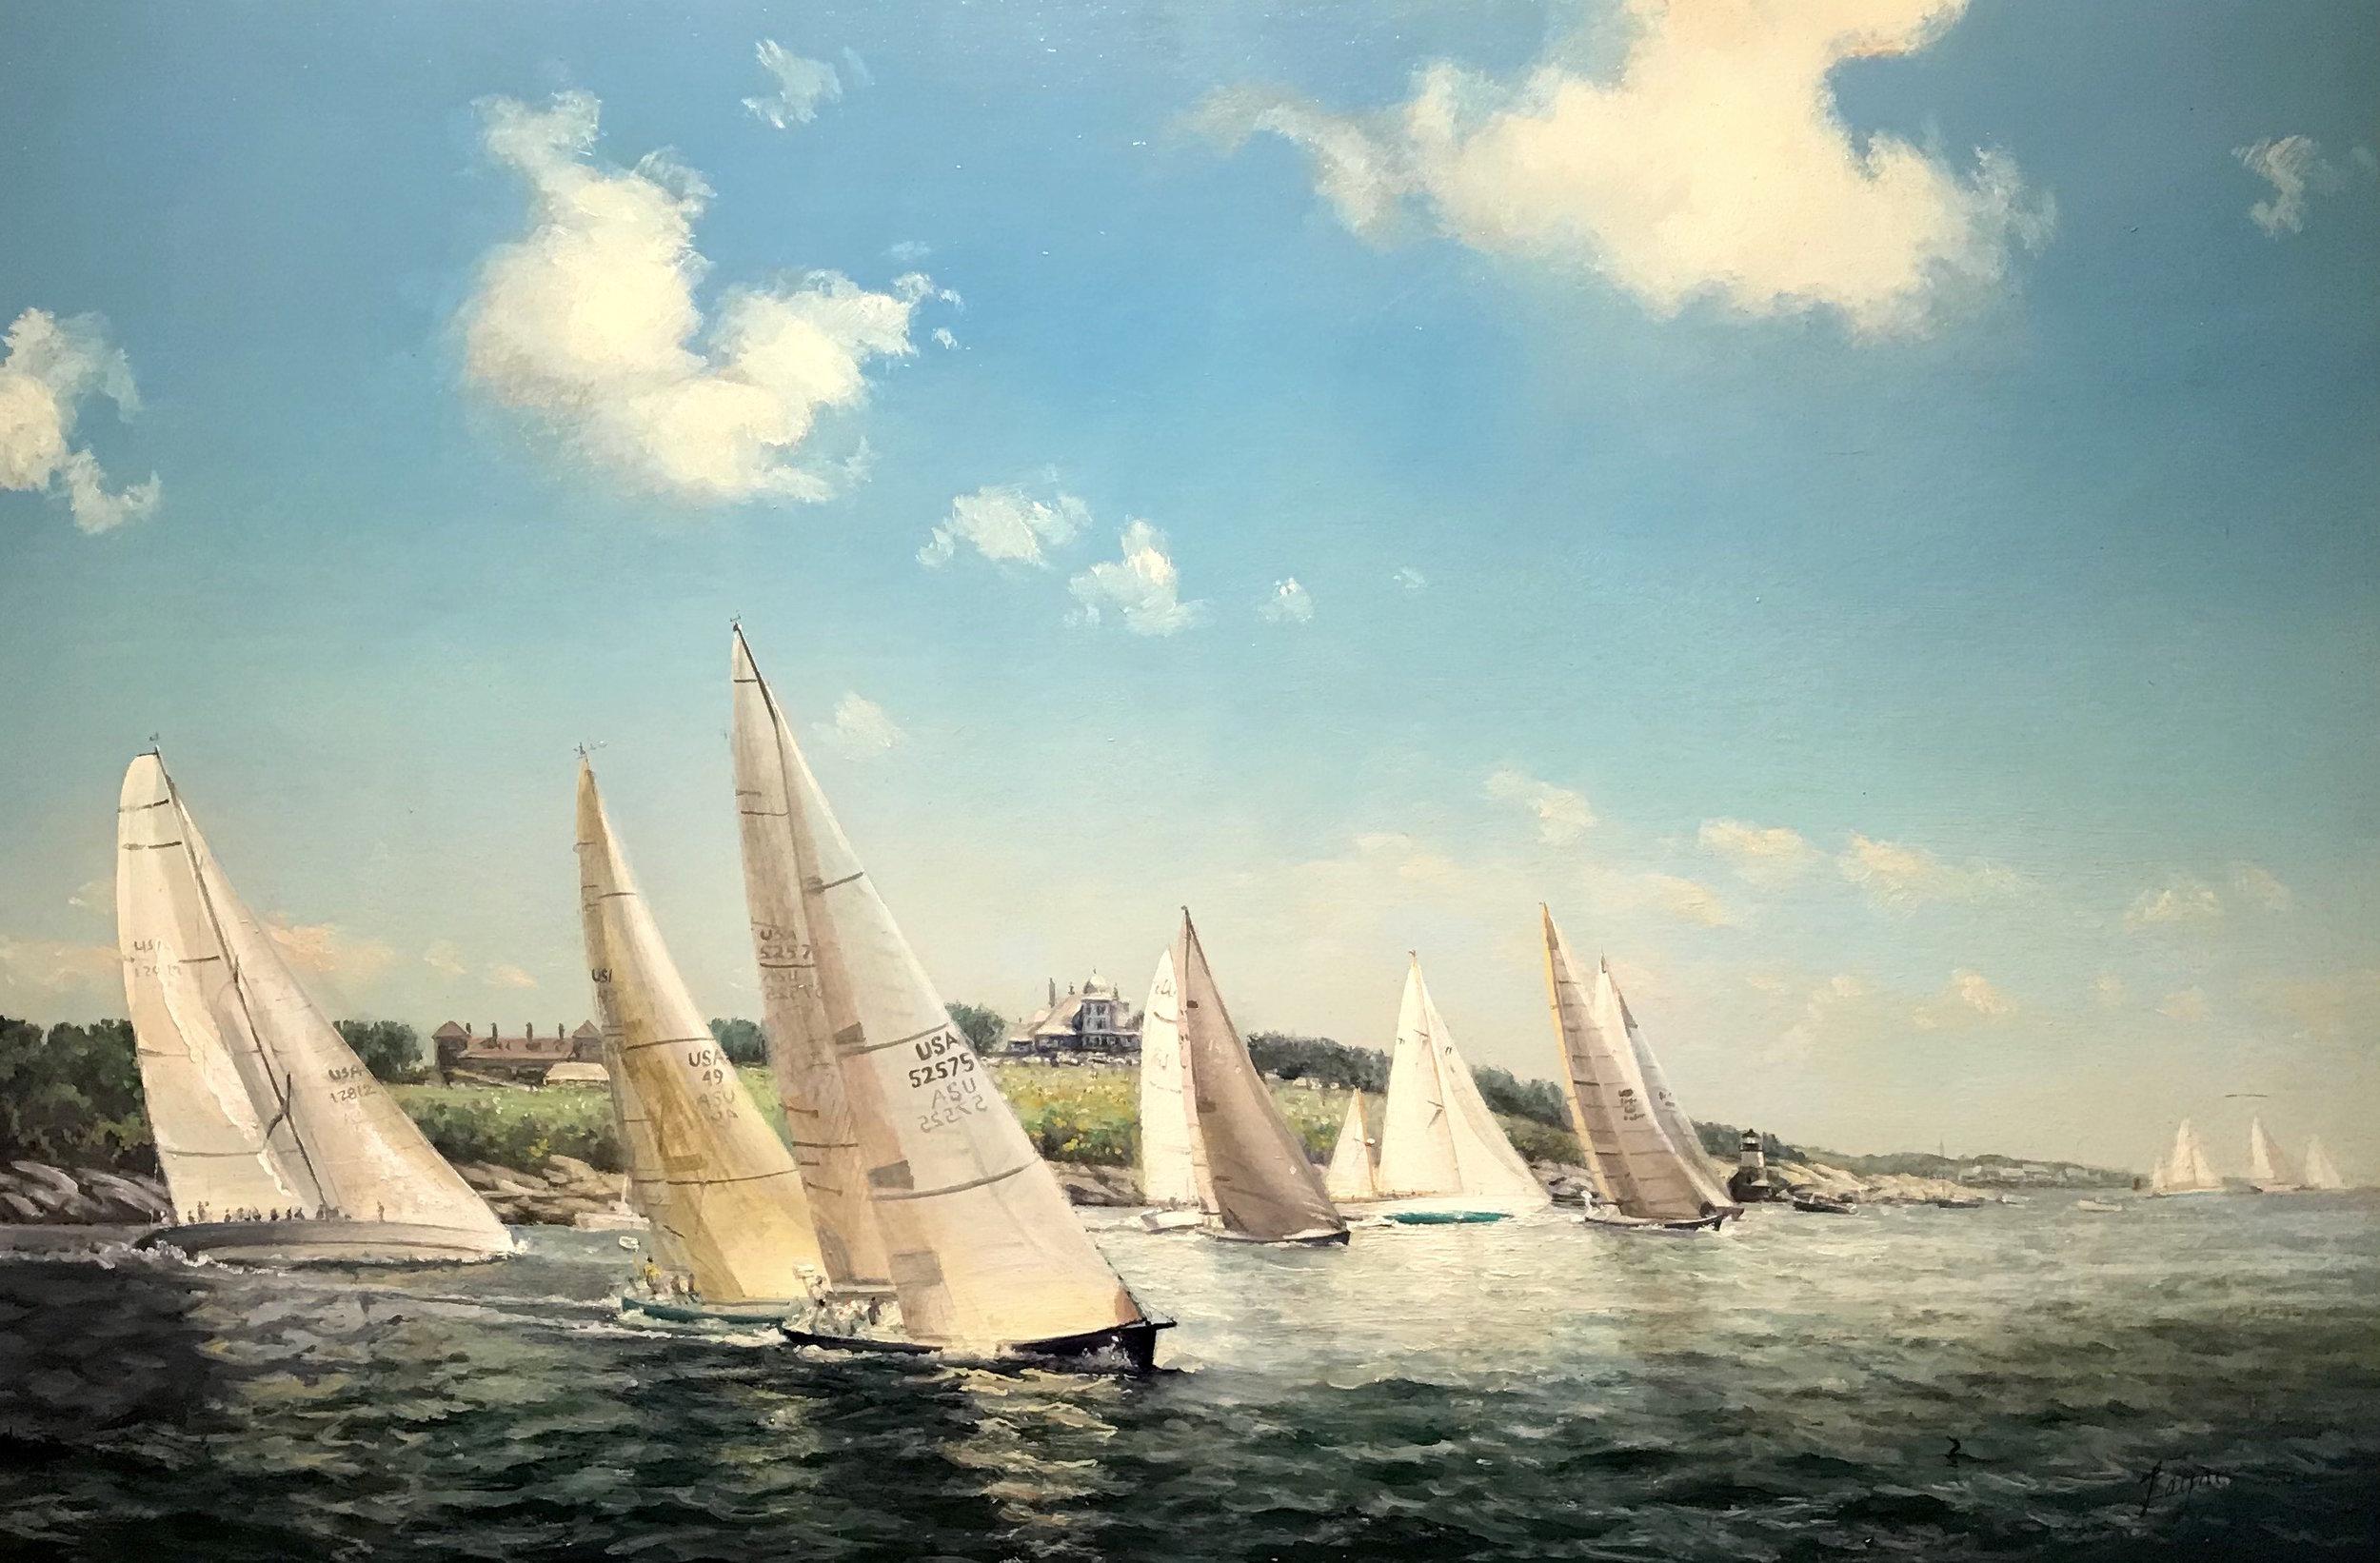 Peter Arguimbau, The Start,Newport to Bermuda Race